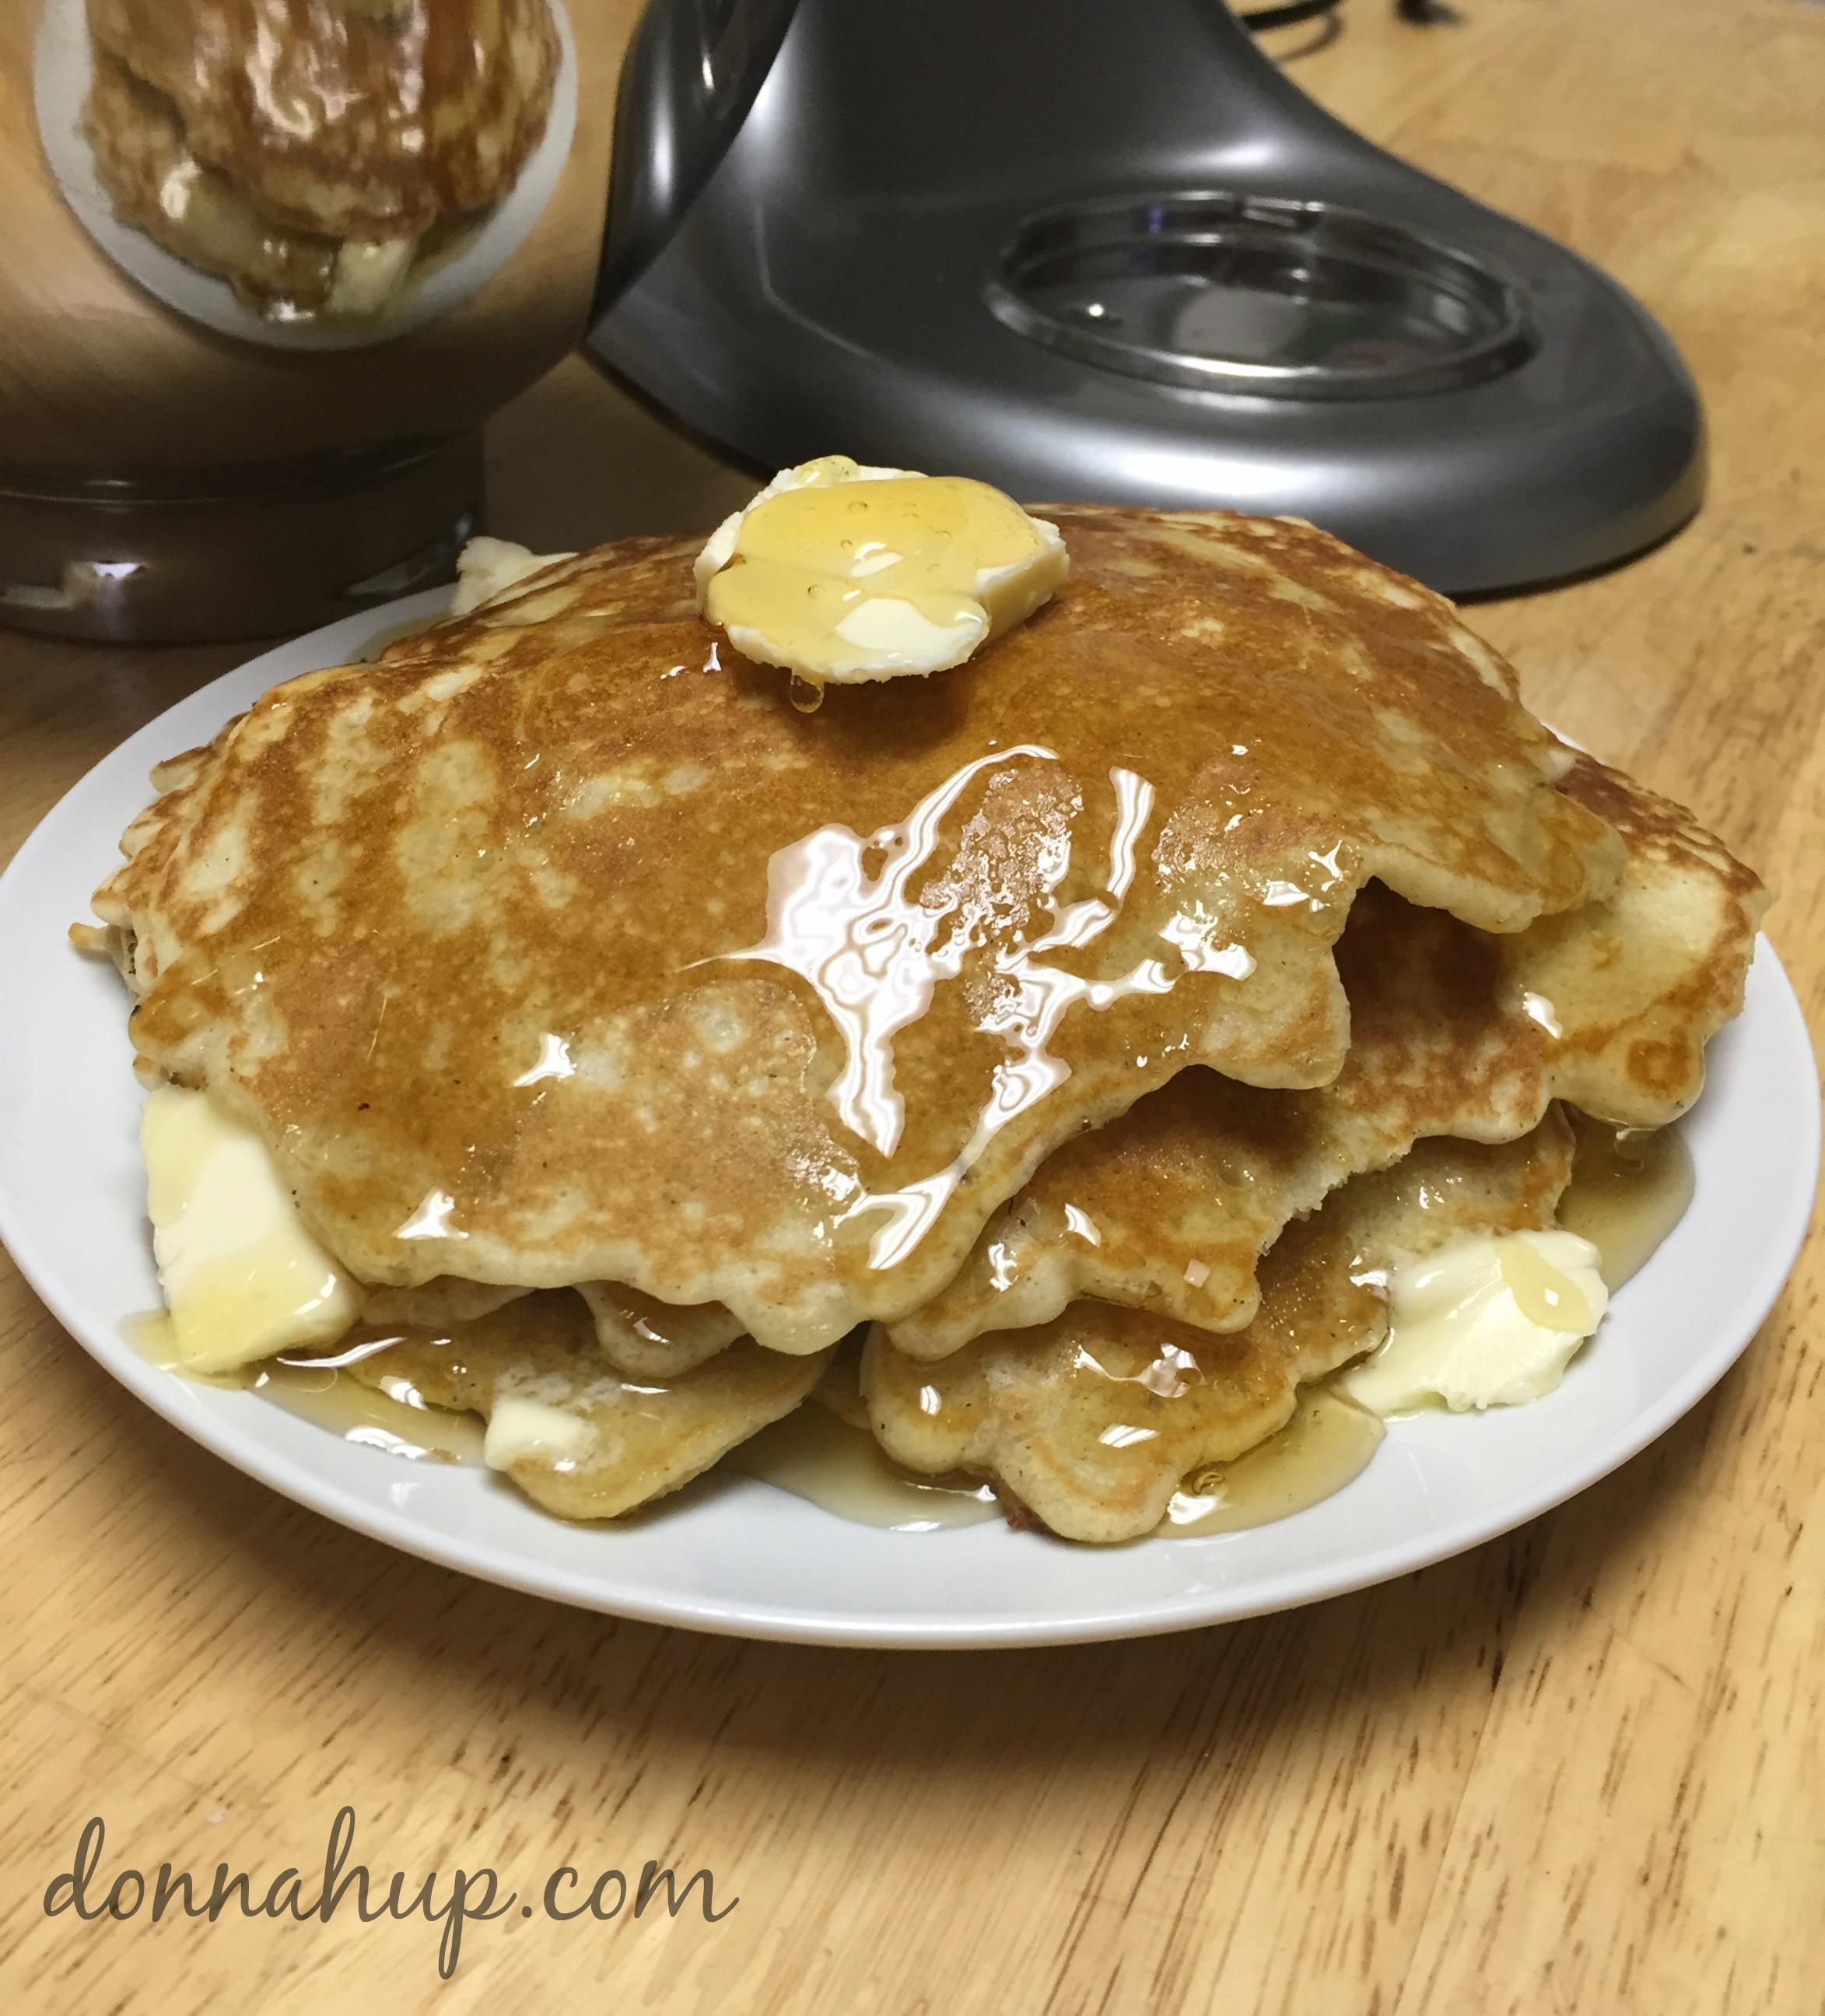 Gluten Free Honey Apple Cinnamon Pancakes with my KitchenAid Mixer